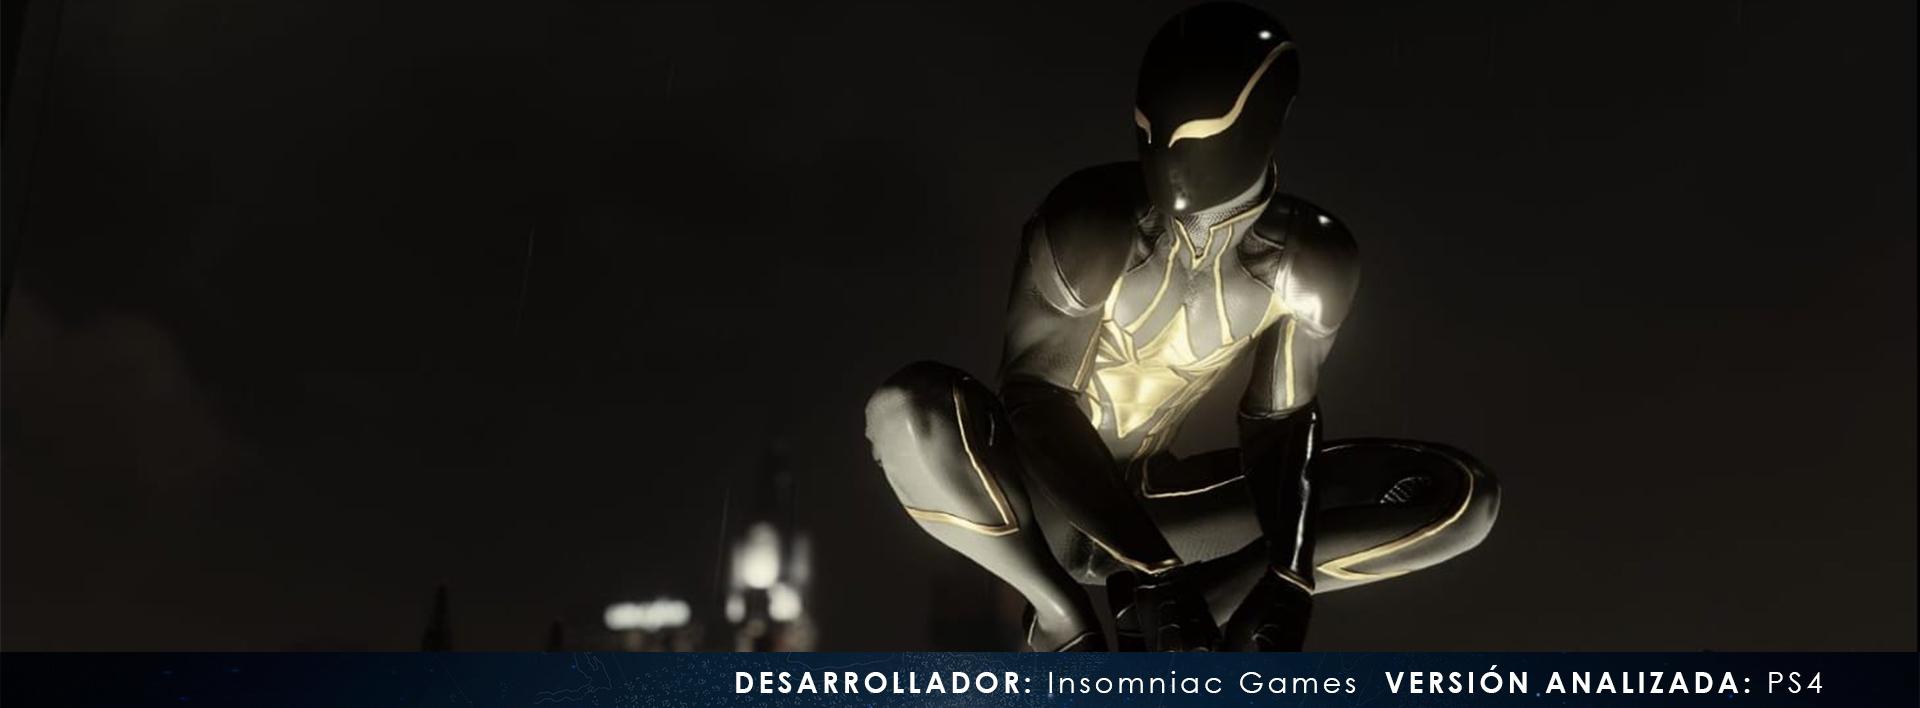 Spider-man encabezado